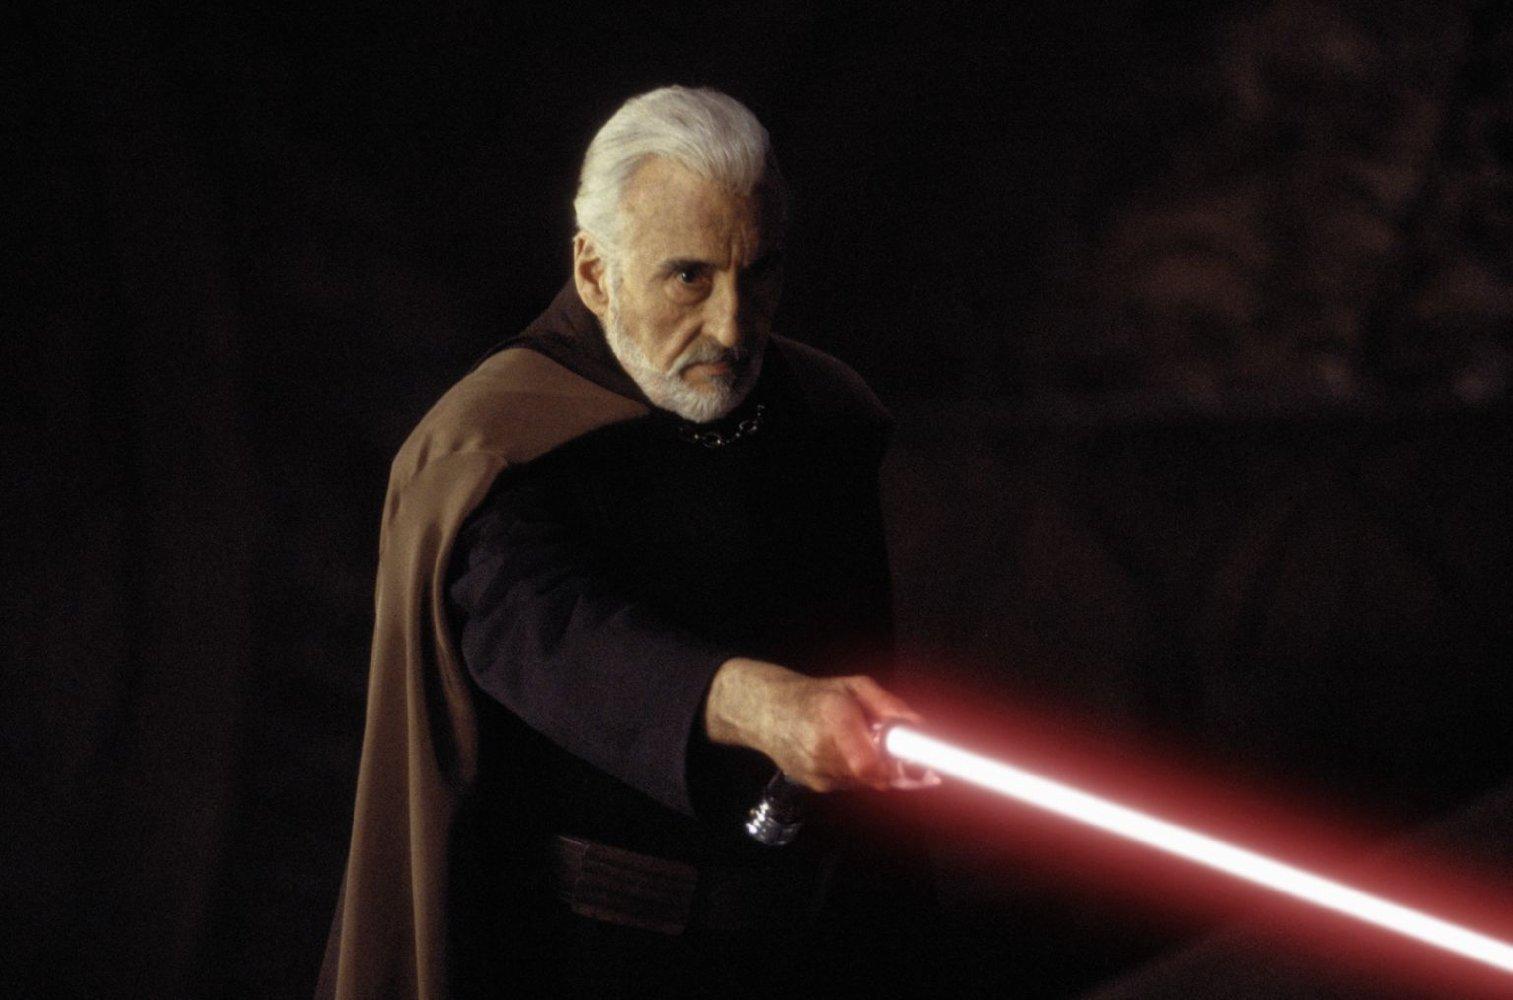 Star Wars: Episode II - Attack Of The Clones